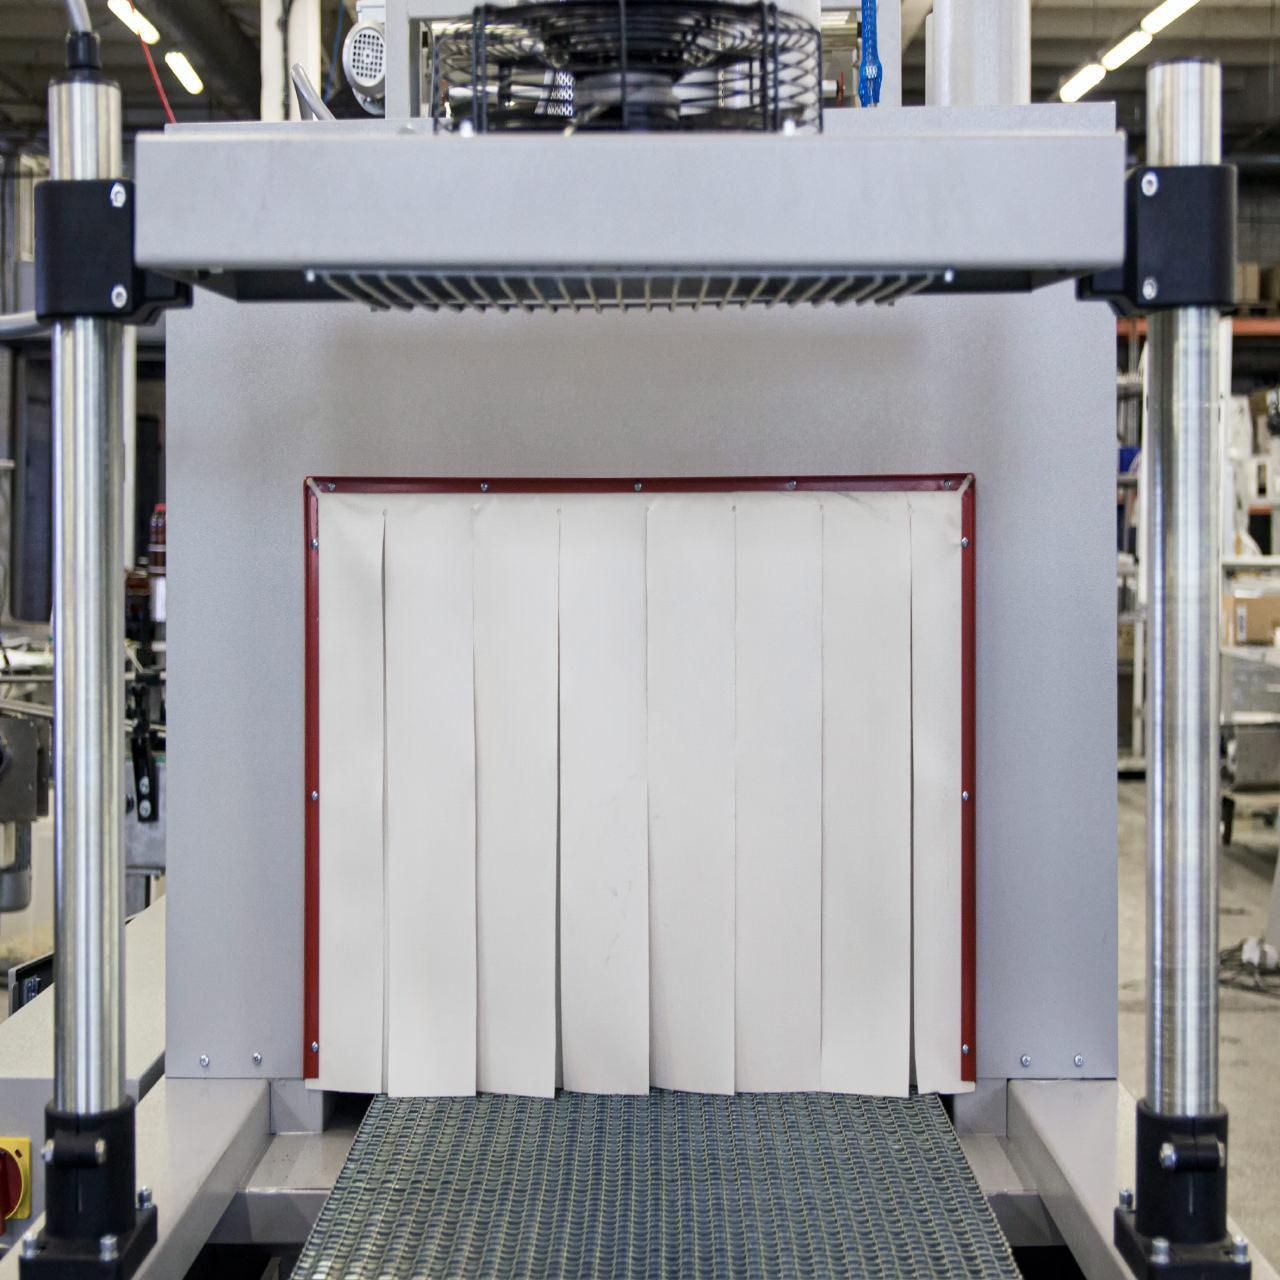 Термоштора силоксановая толщина 0,35 мм для термотоннелей белая